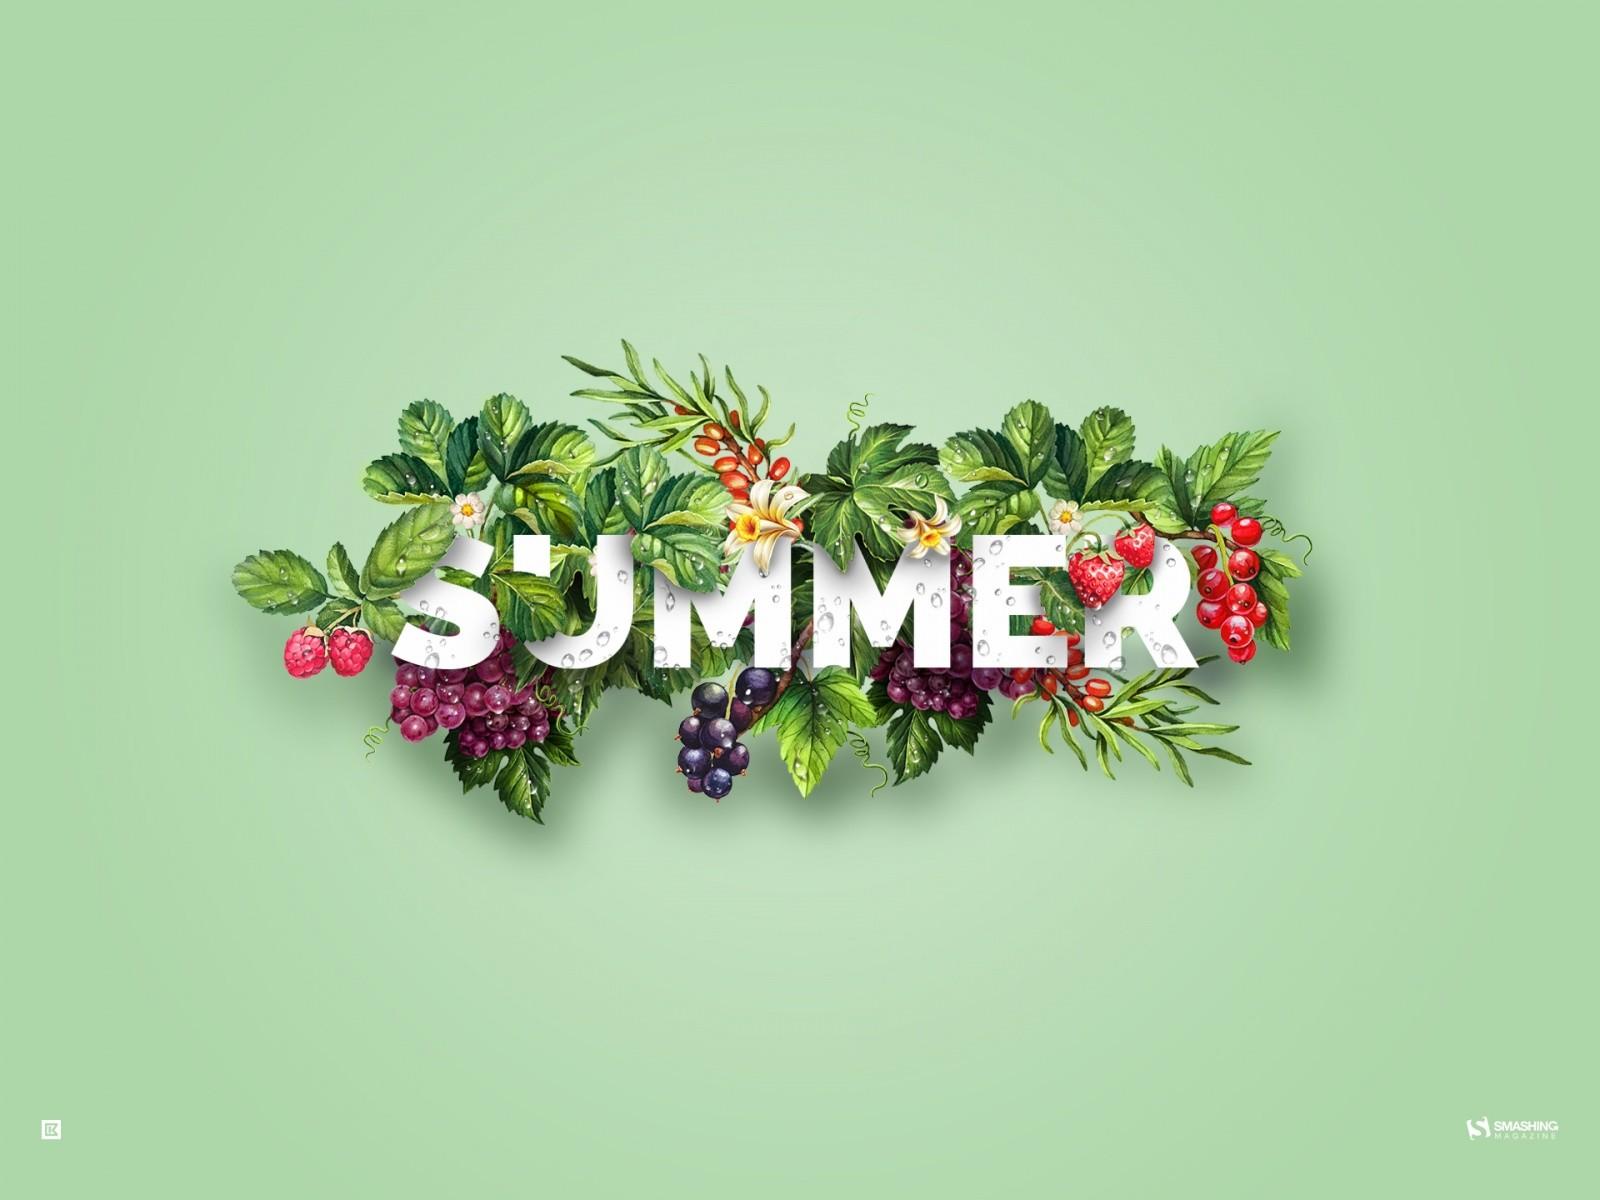 Free Summer phone wallpaper by tonyadimick